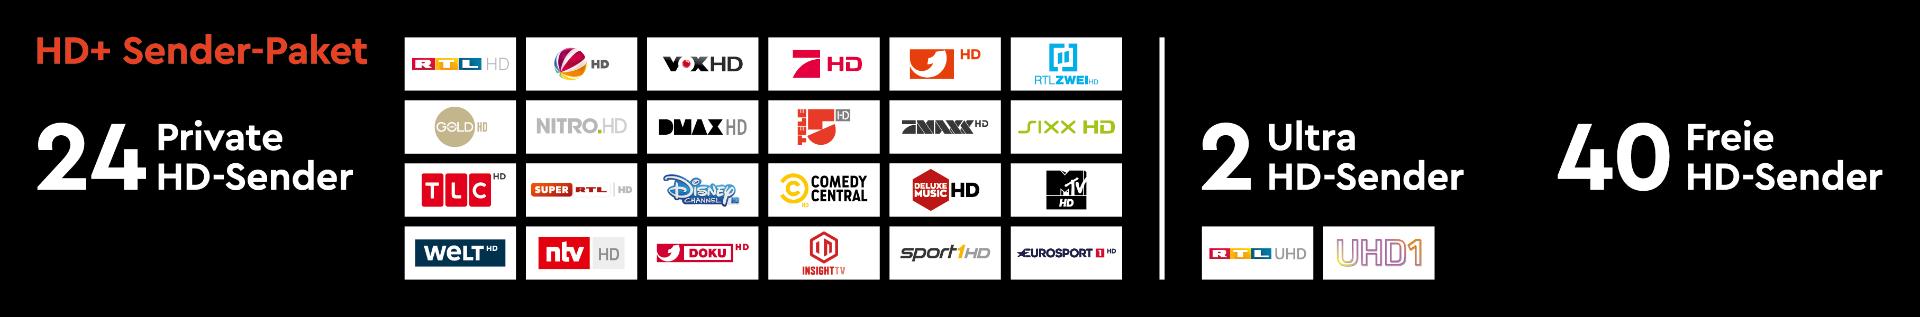 HD+ Sender